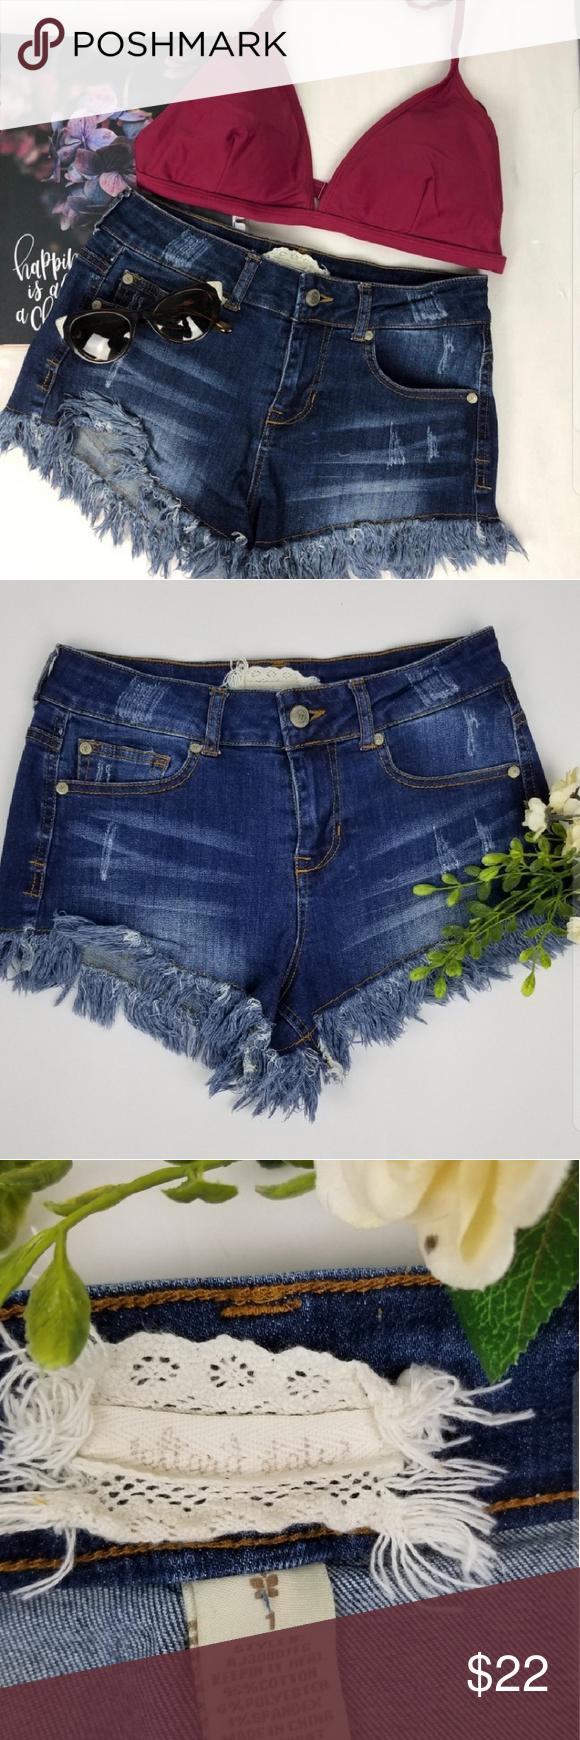 784b4df71da3c3 ALTAR'D STATE fringe bottom jean shorts •Width: 14